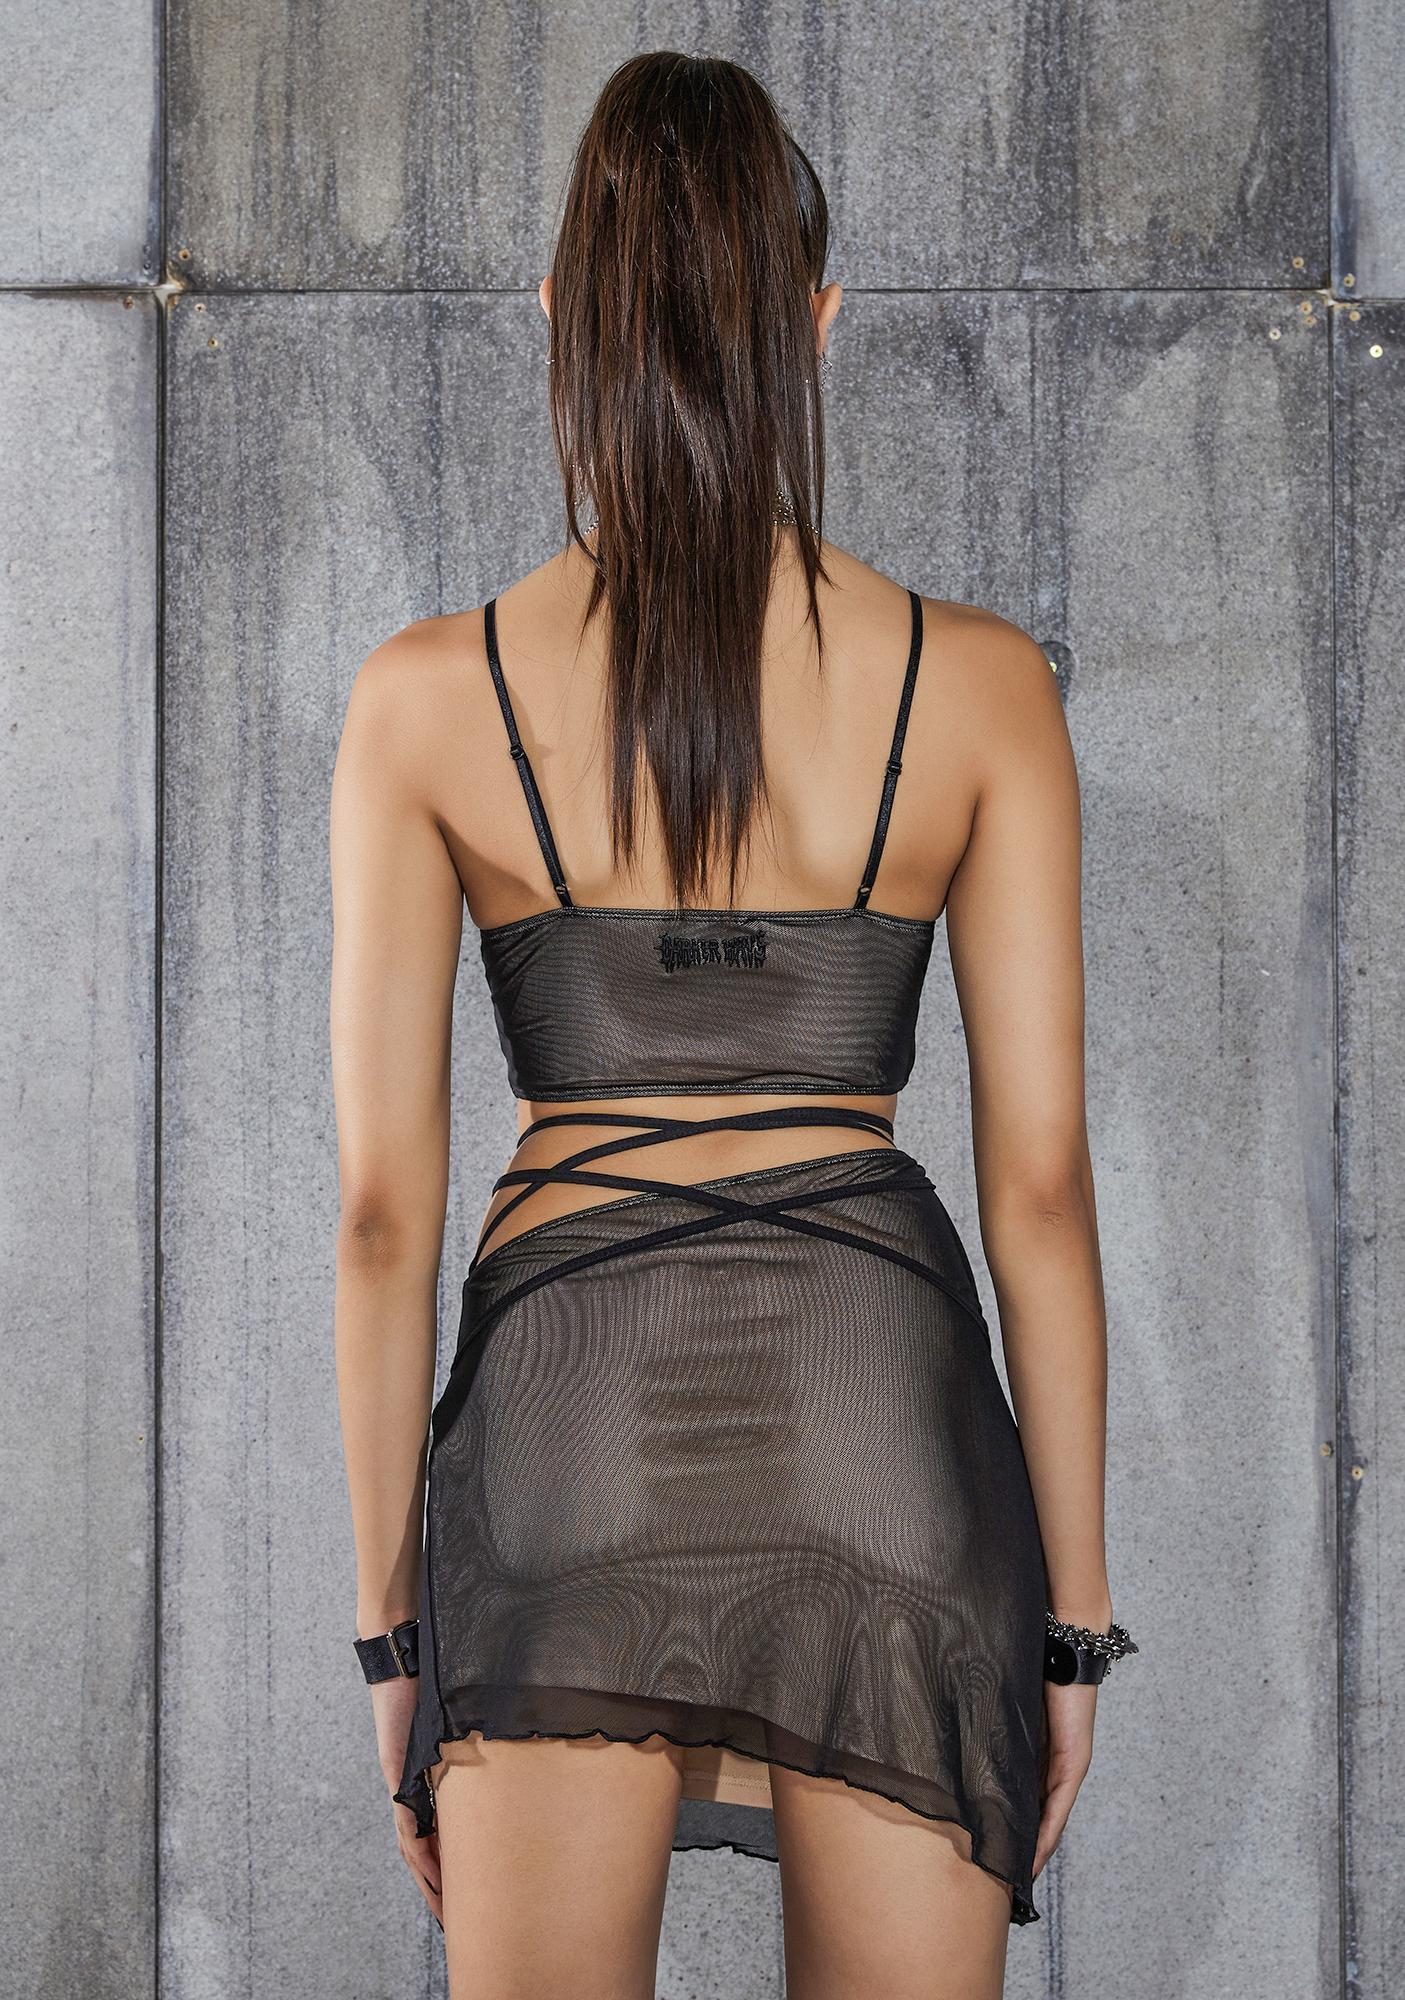 DARKER WAVS Snare Mesh Overlay Cut-Out Buckle Skirt Set